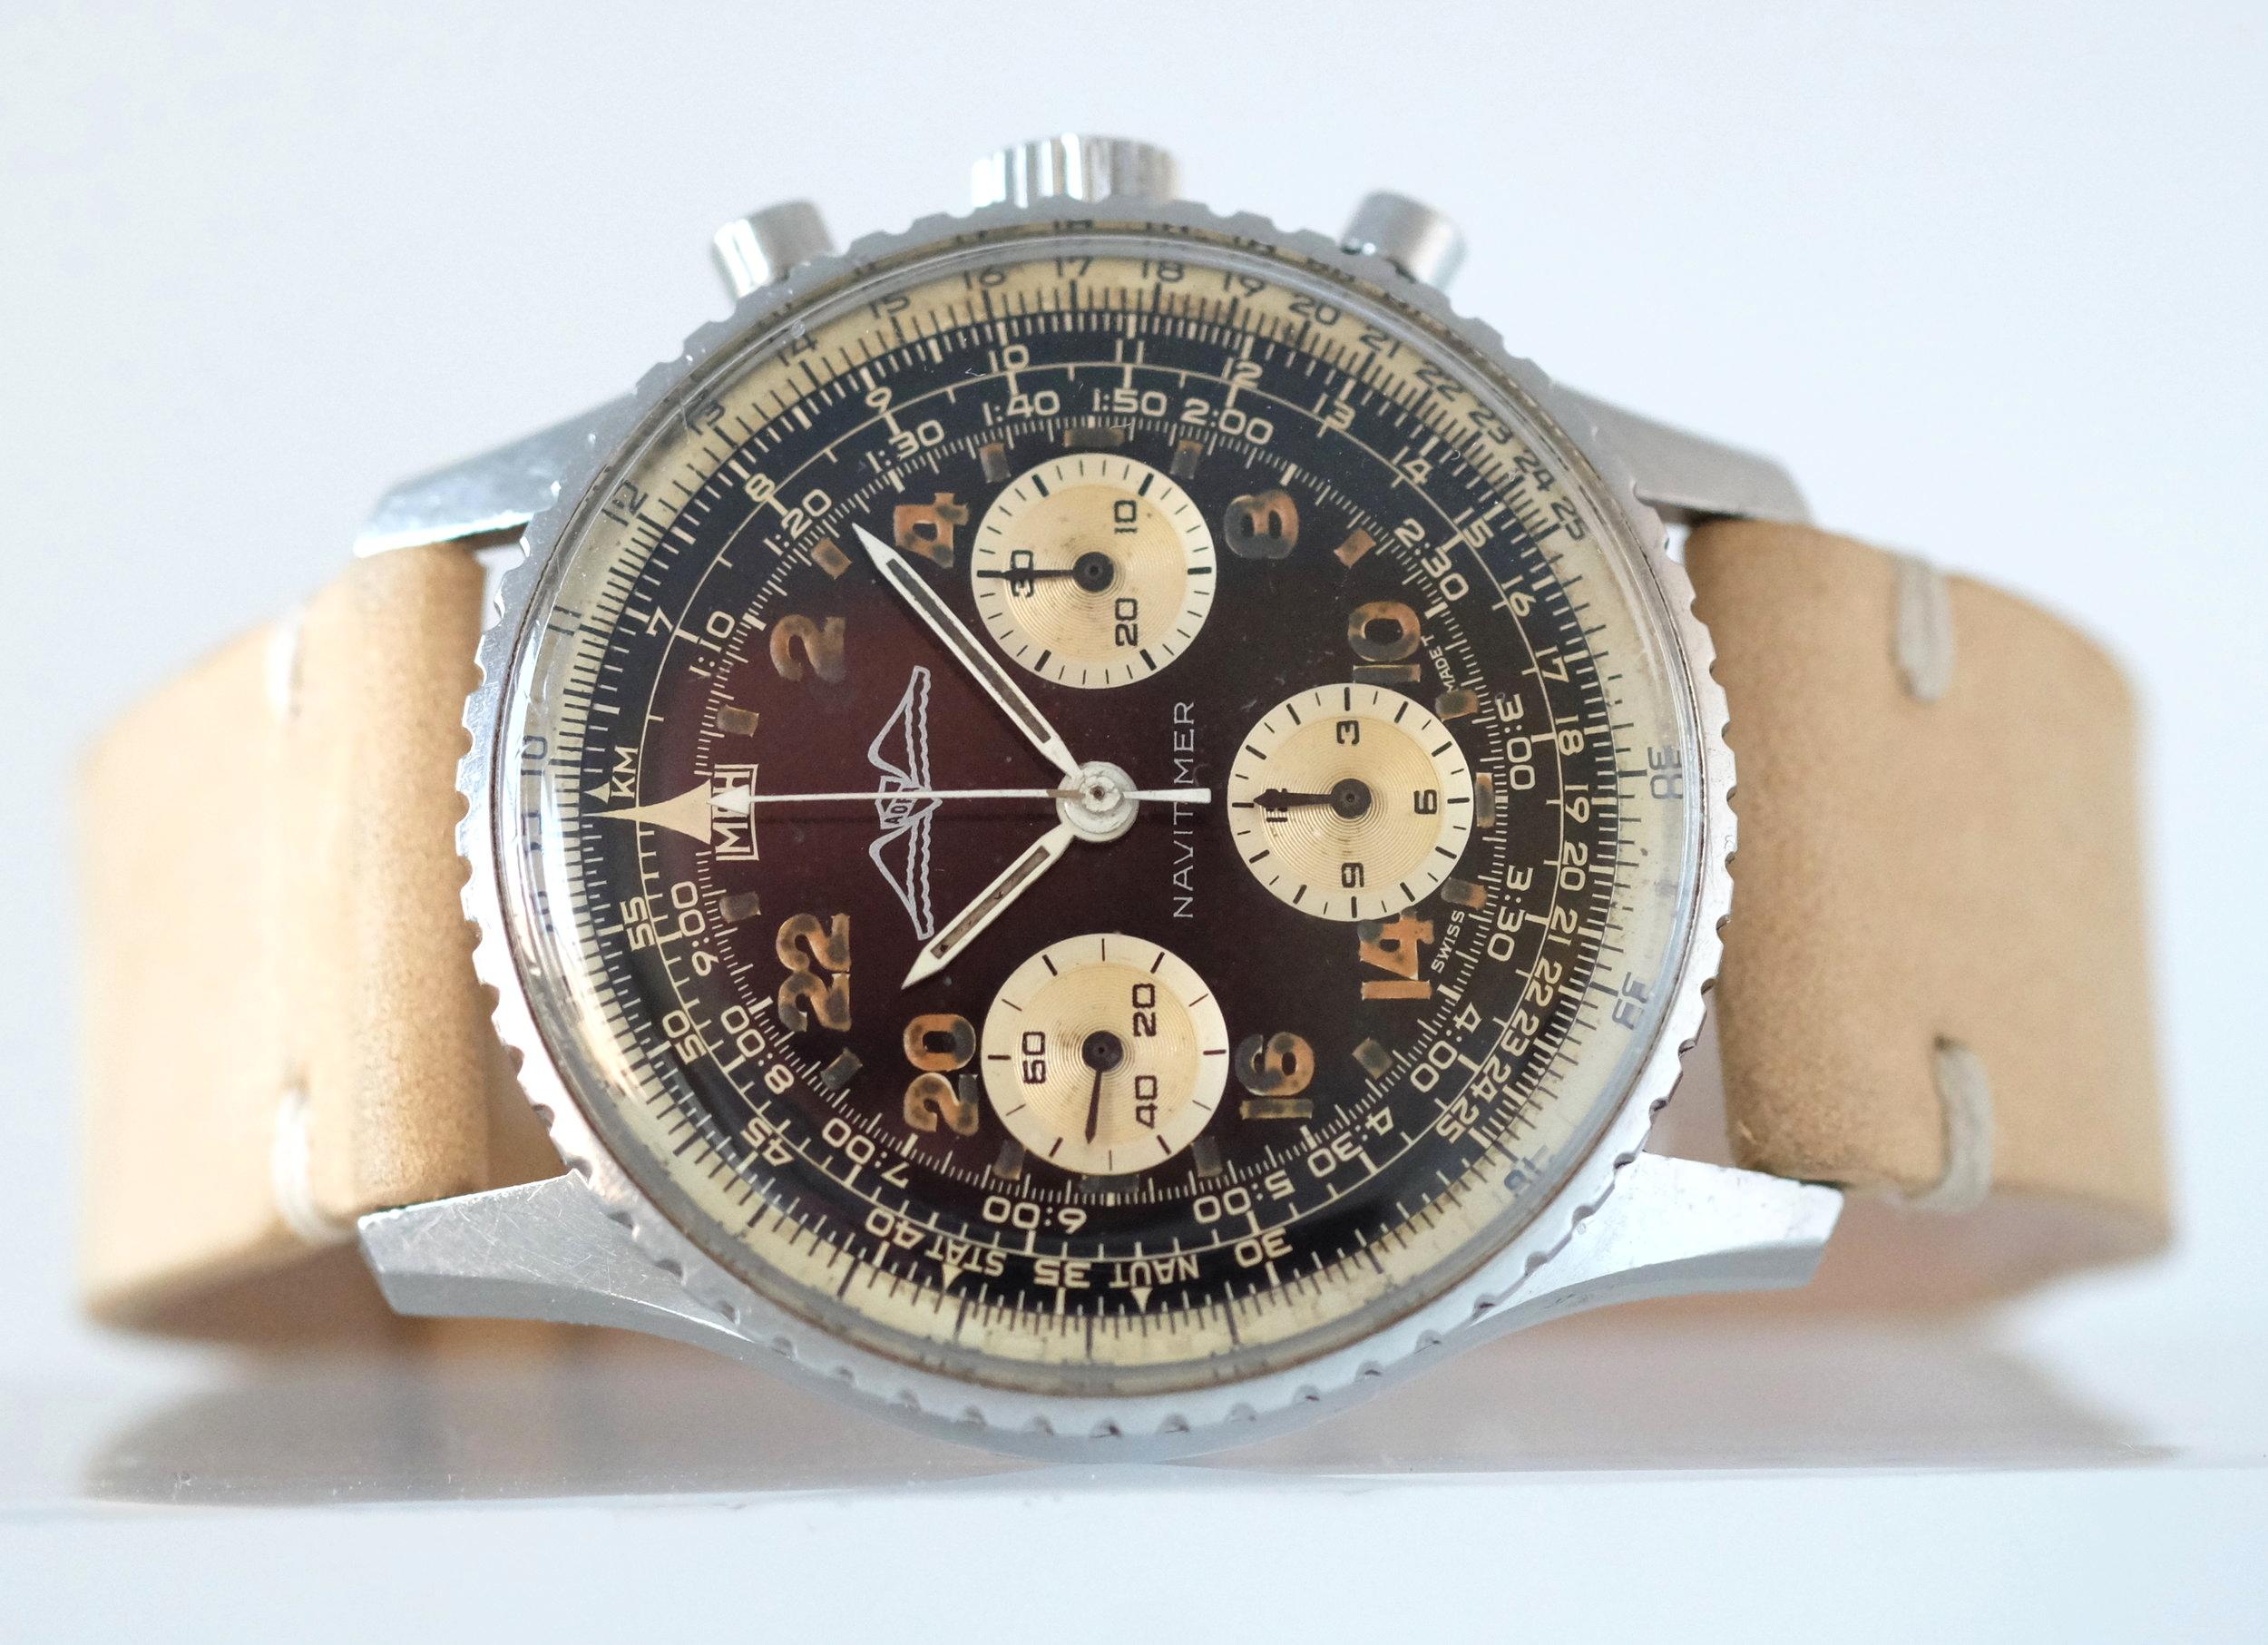 Breitling Navitimer Cosmonaute Ref. 809   SOLD